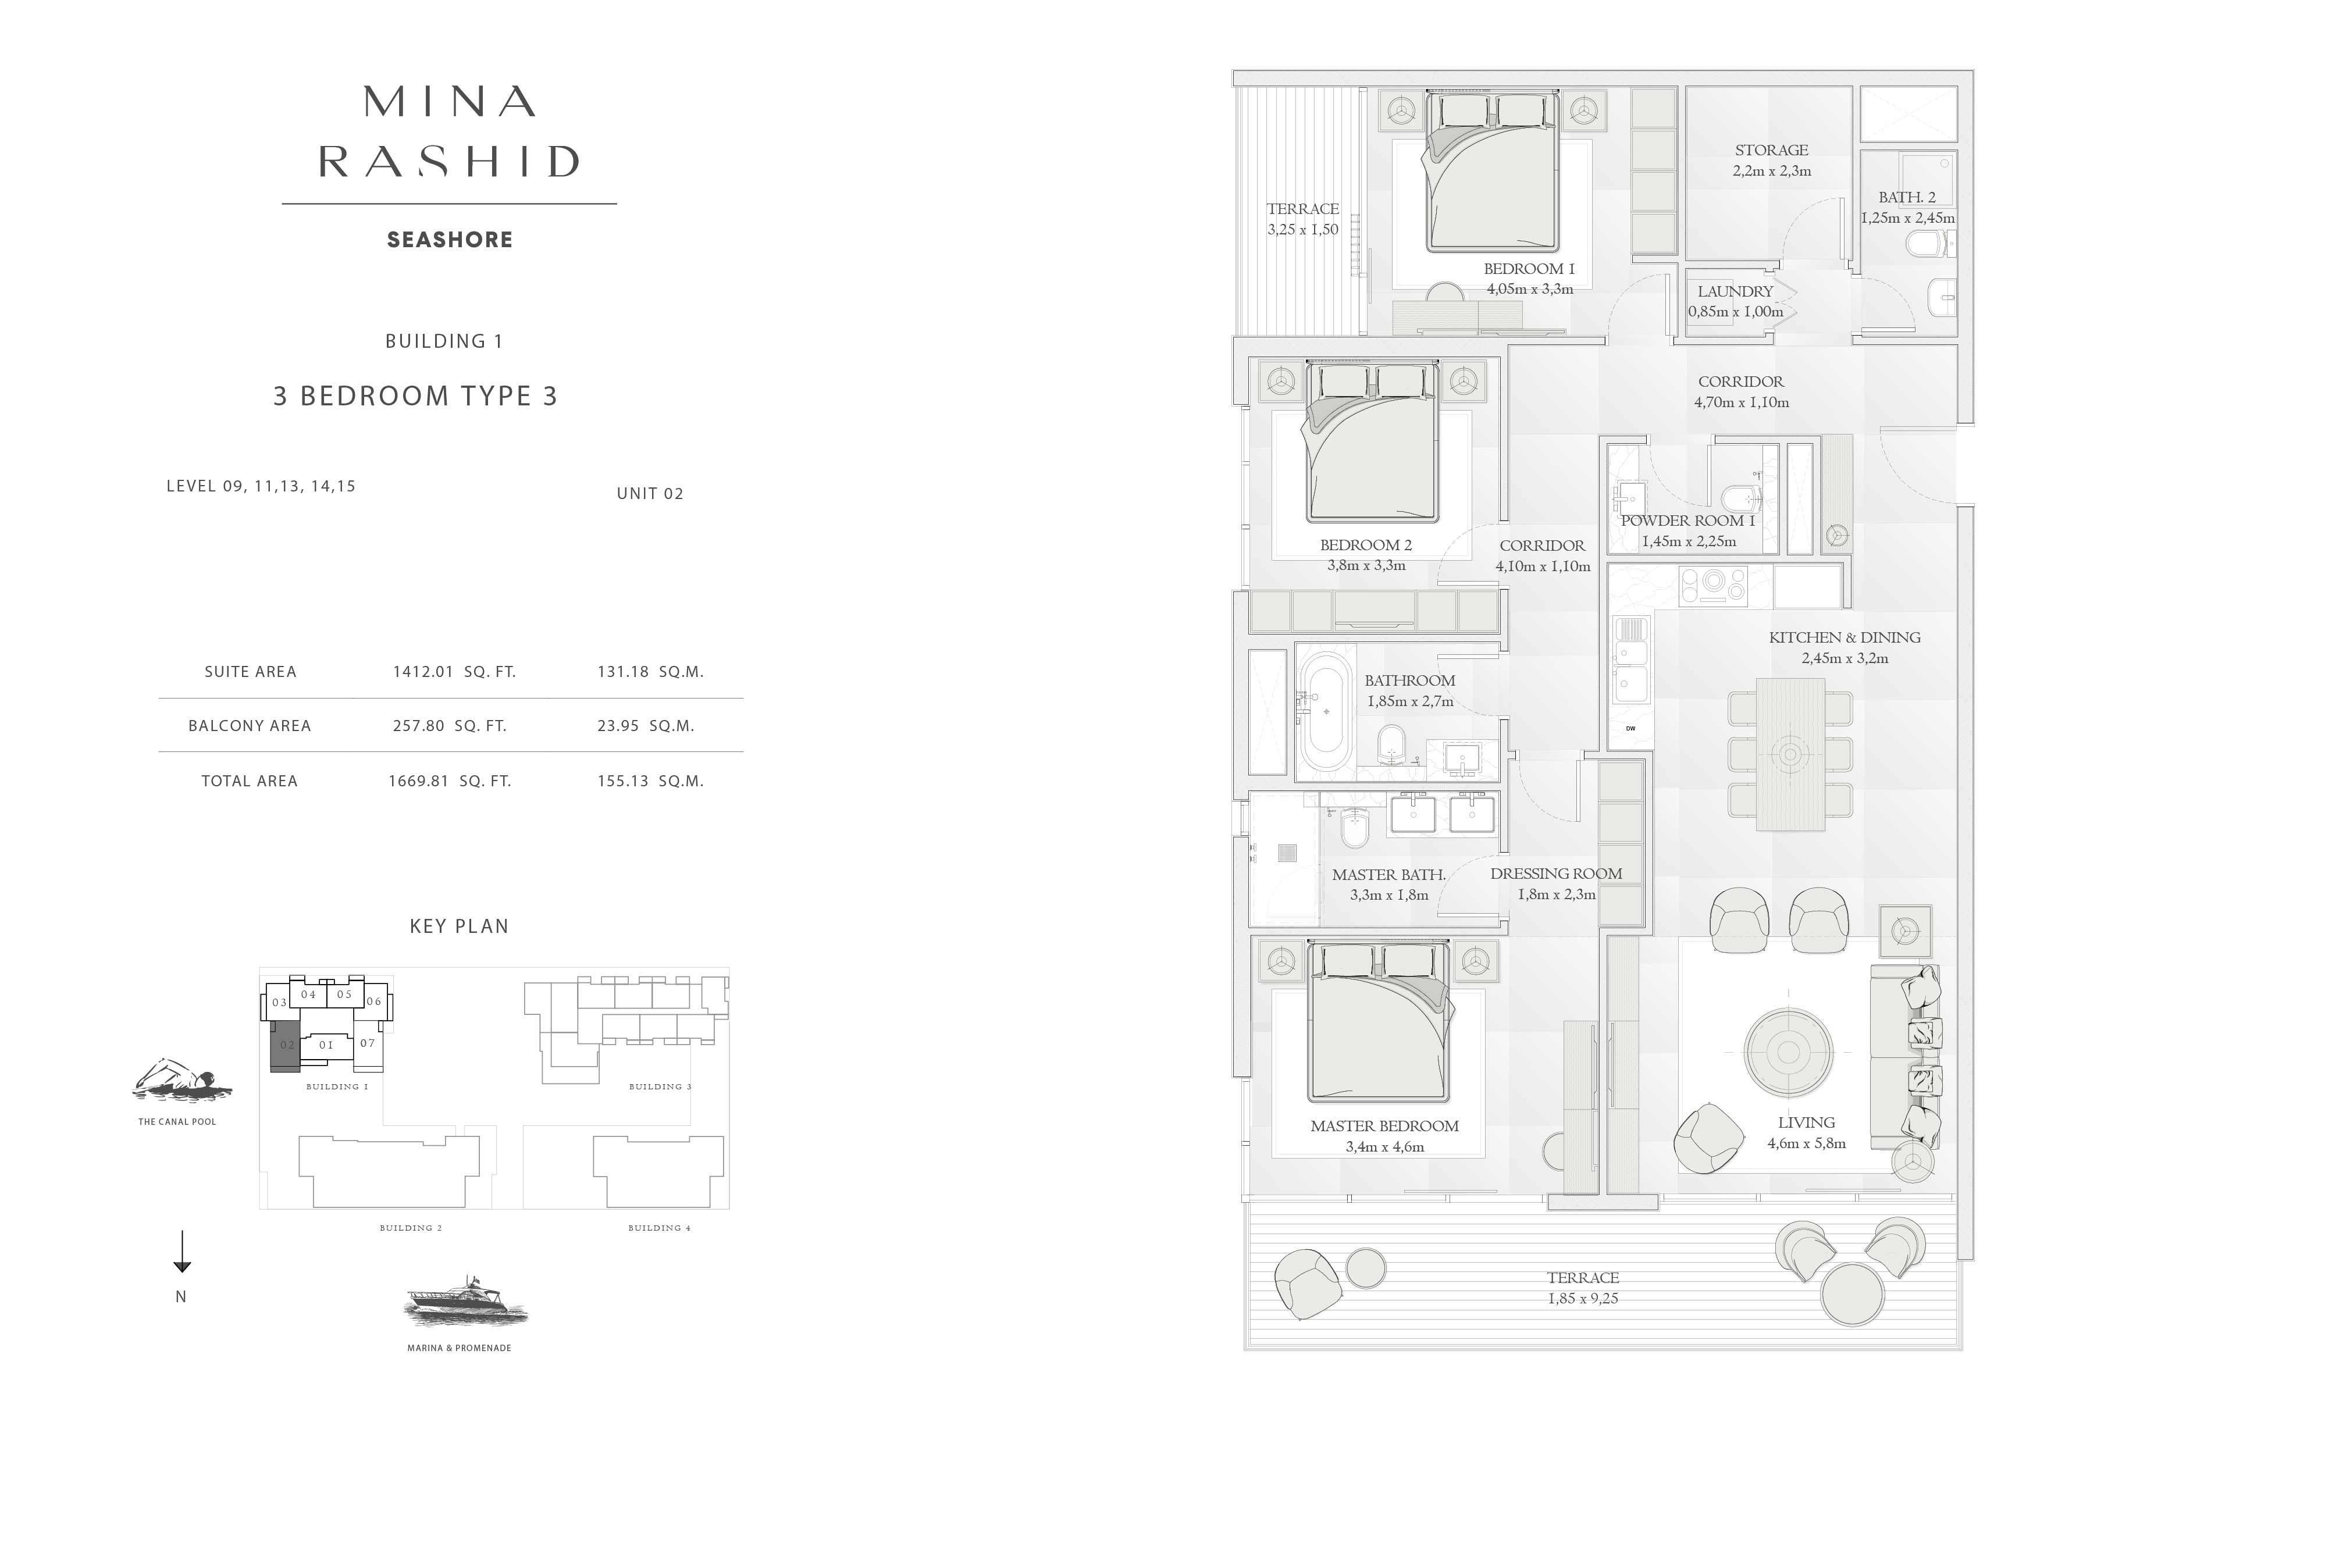 Building-1, 3-Bedroom Type-3, Size-1669-Sq Ft